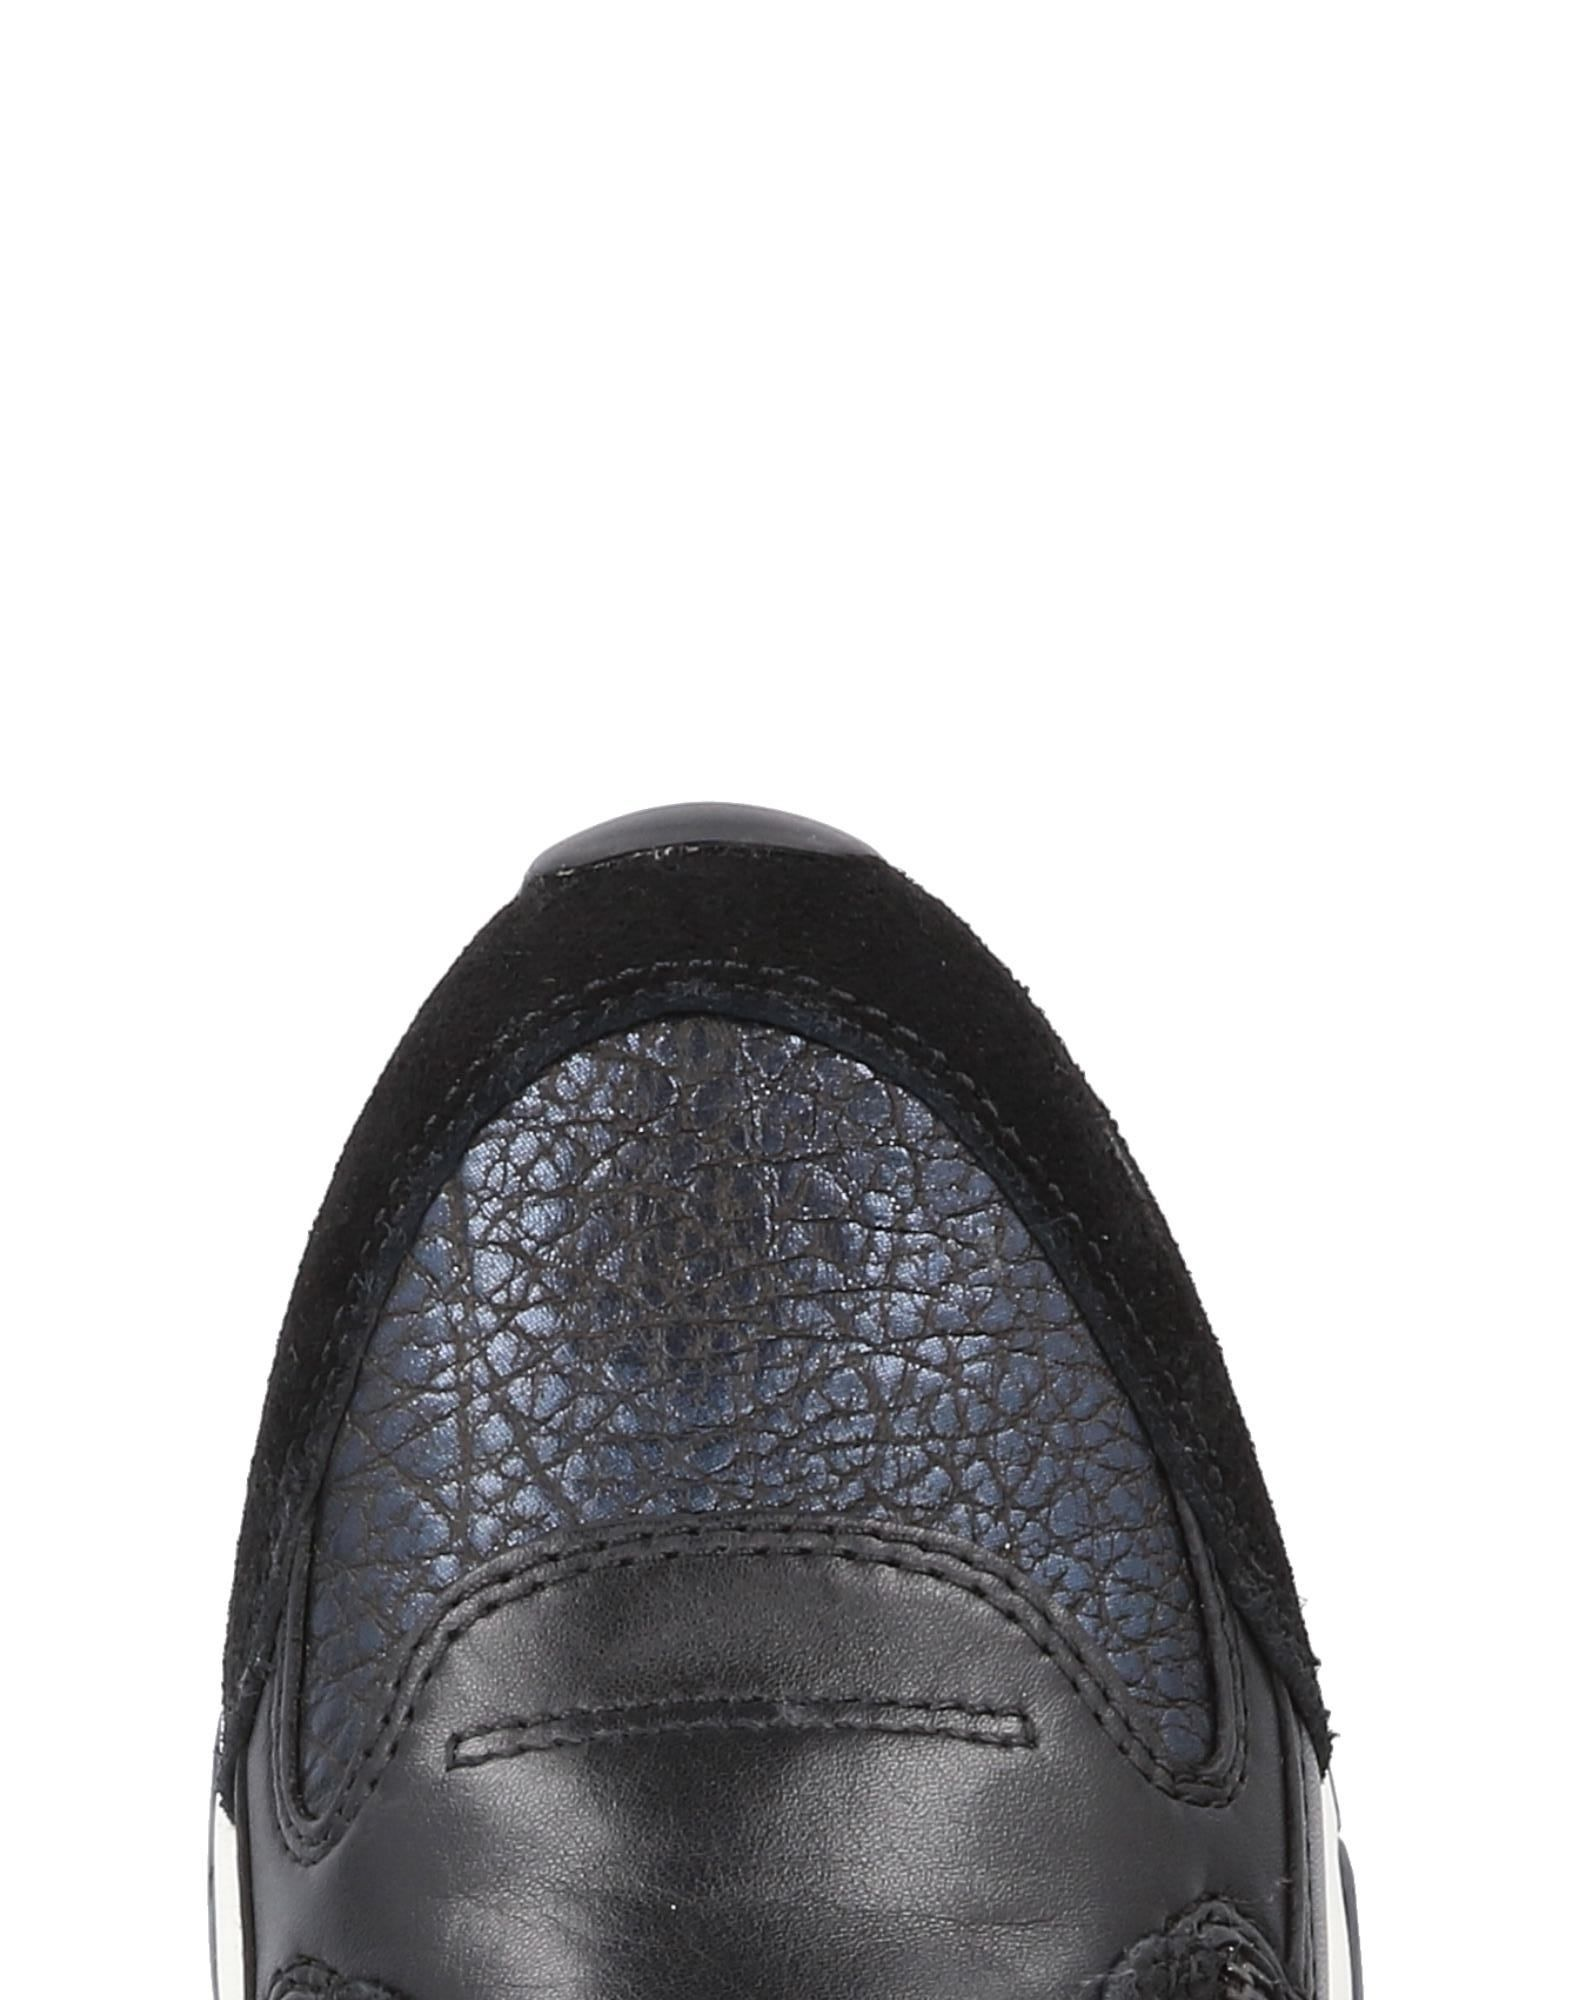 Ash Sneakers Sneakers Sneakers Damen  11470951CEGut aussehende strapazierfähige Schuhe 0177db